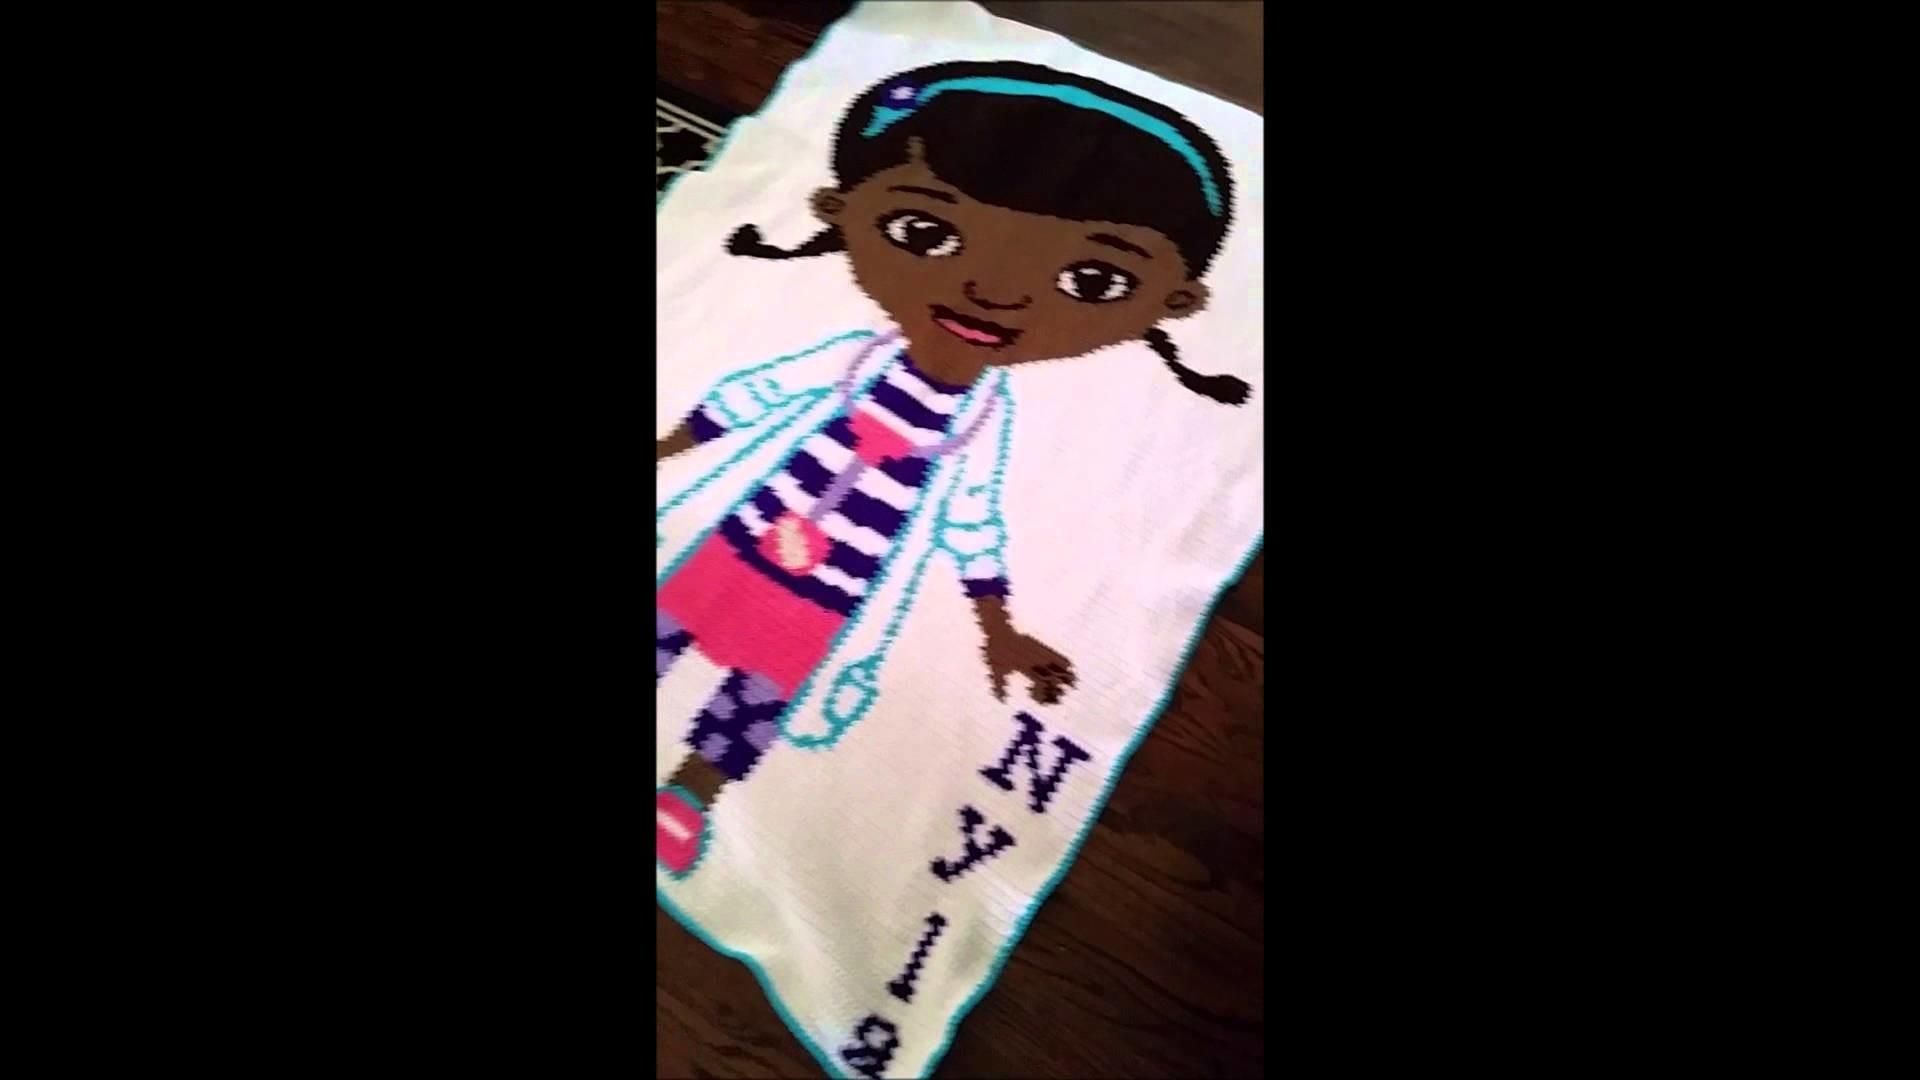 Mcstuffins Inspired Crochet Blanket. Graphghan